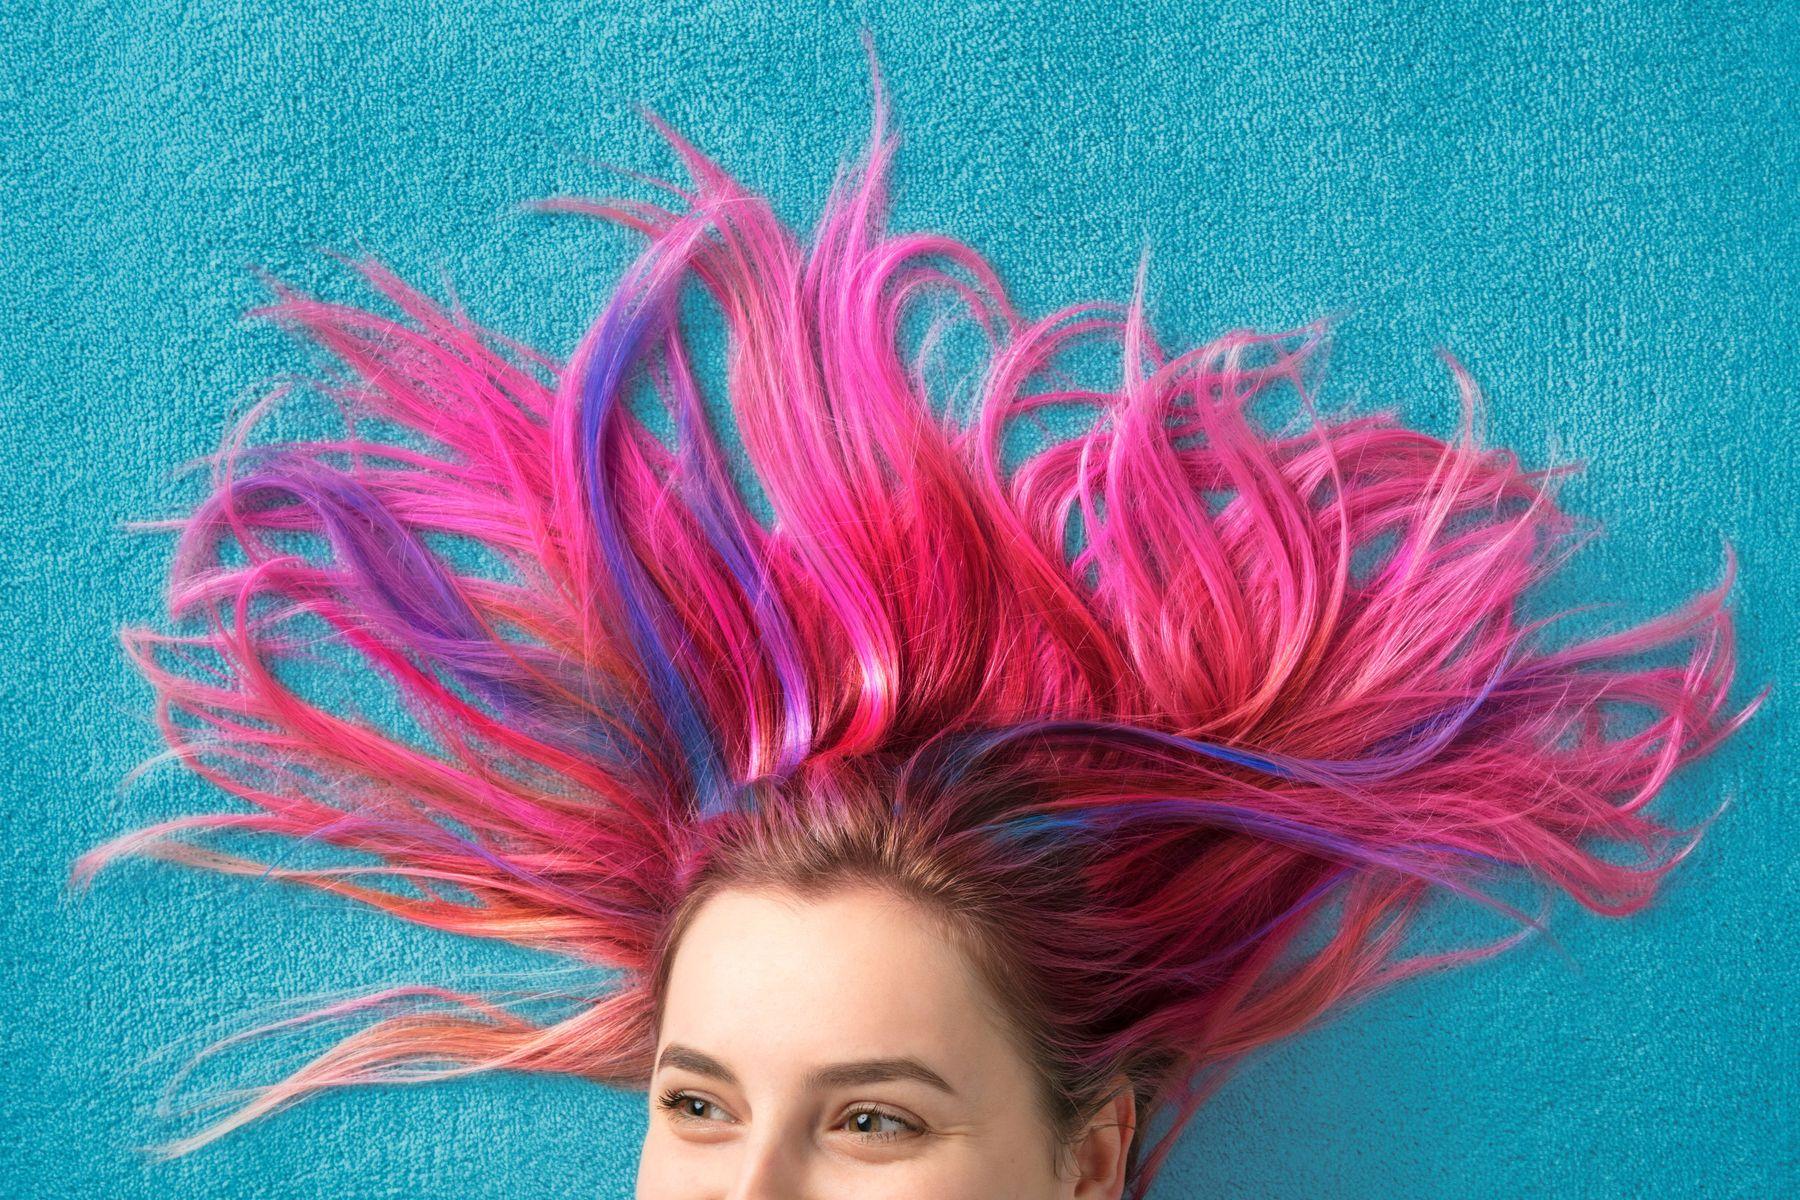 rambut warna fuchsia dan ungu